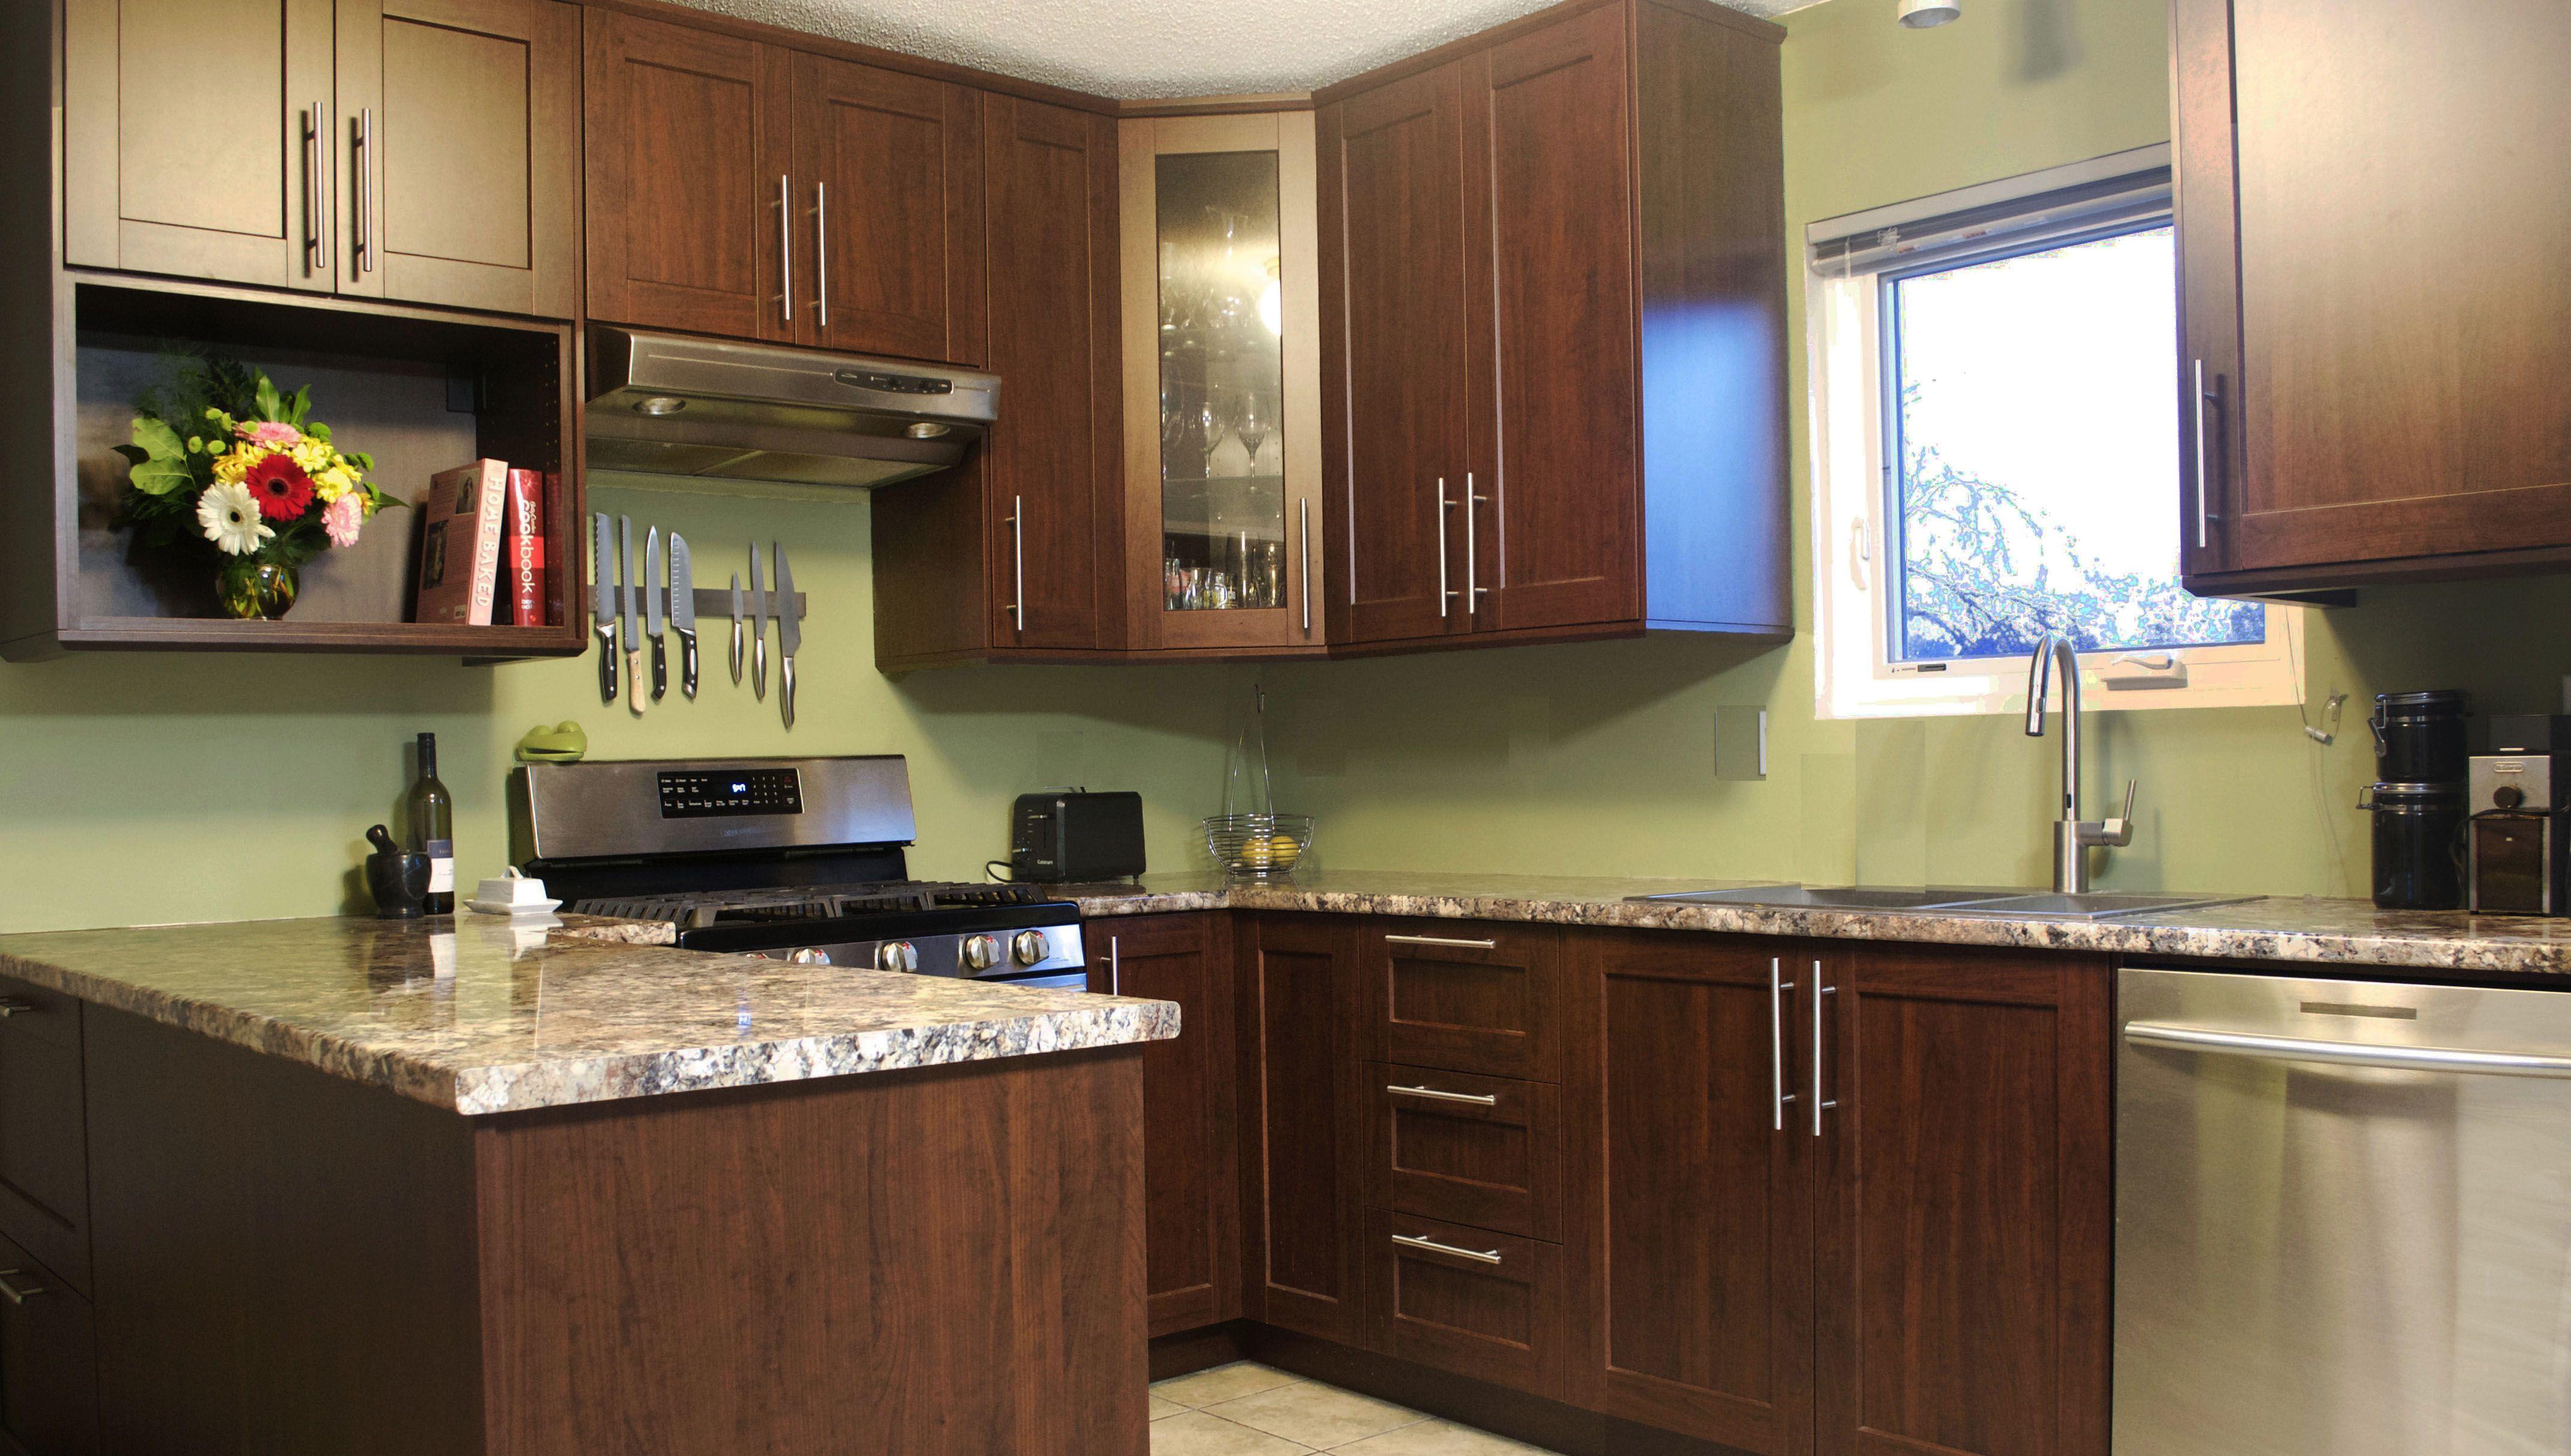 Browse Ikea S Door Styles And Ikan S Portfolio Of Kitchens From Vancouver Island Homes Victoria S Top Installation Te Ikea Inspiration Ikea Kitchen Doors Ikea